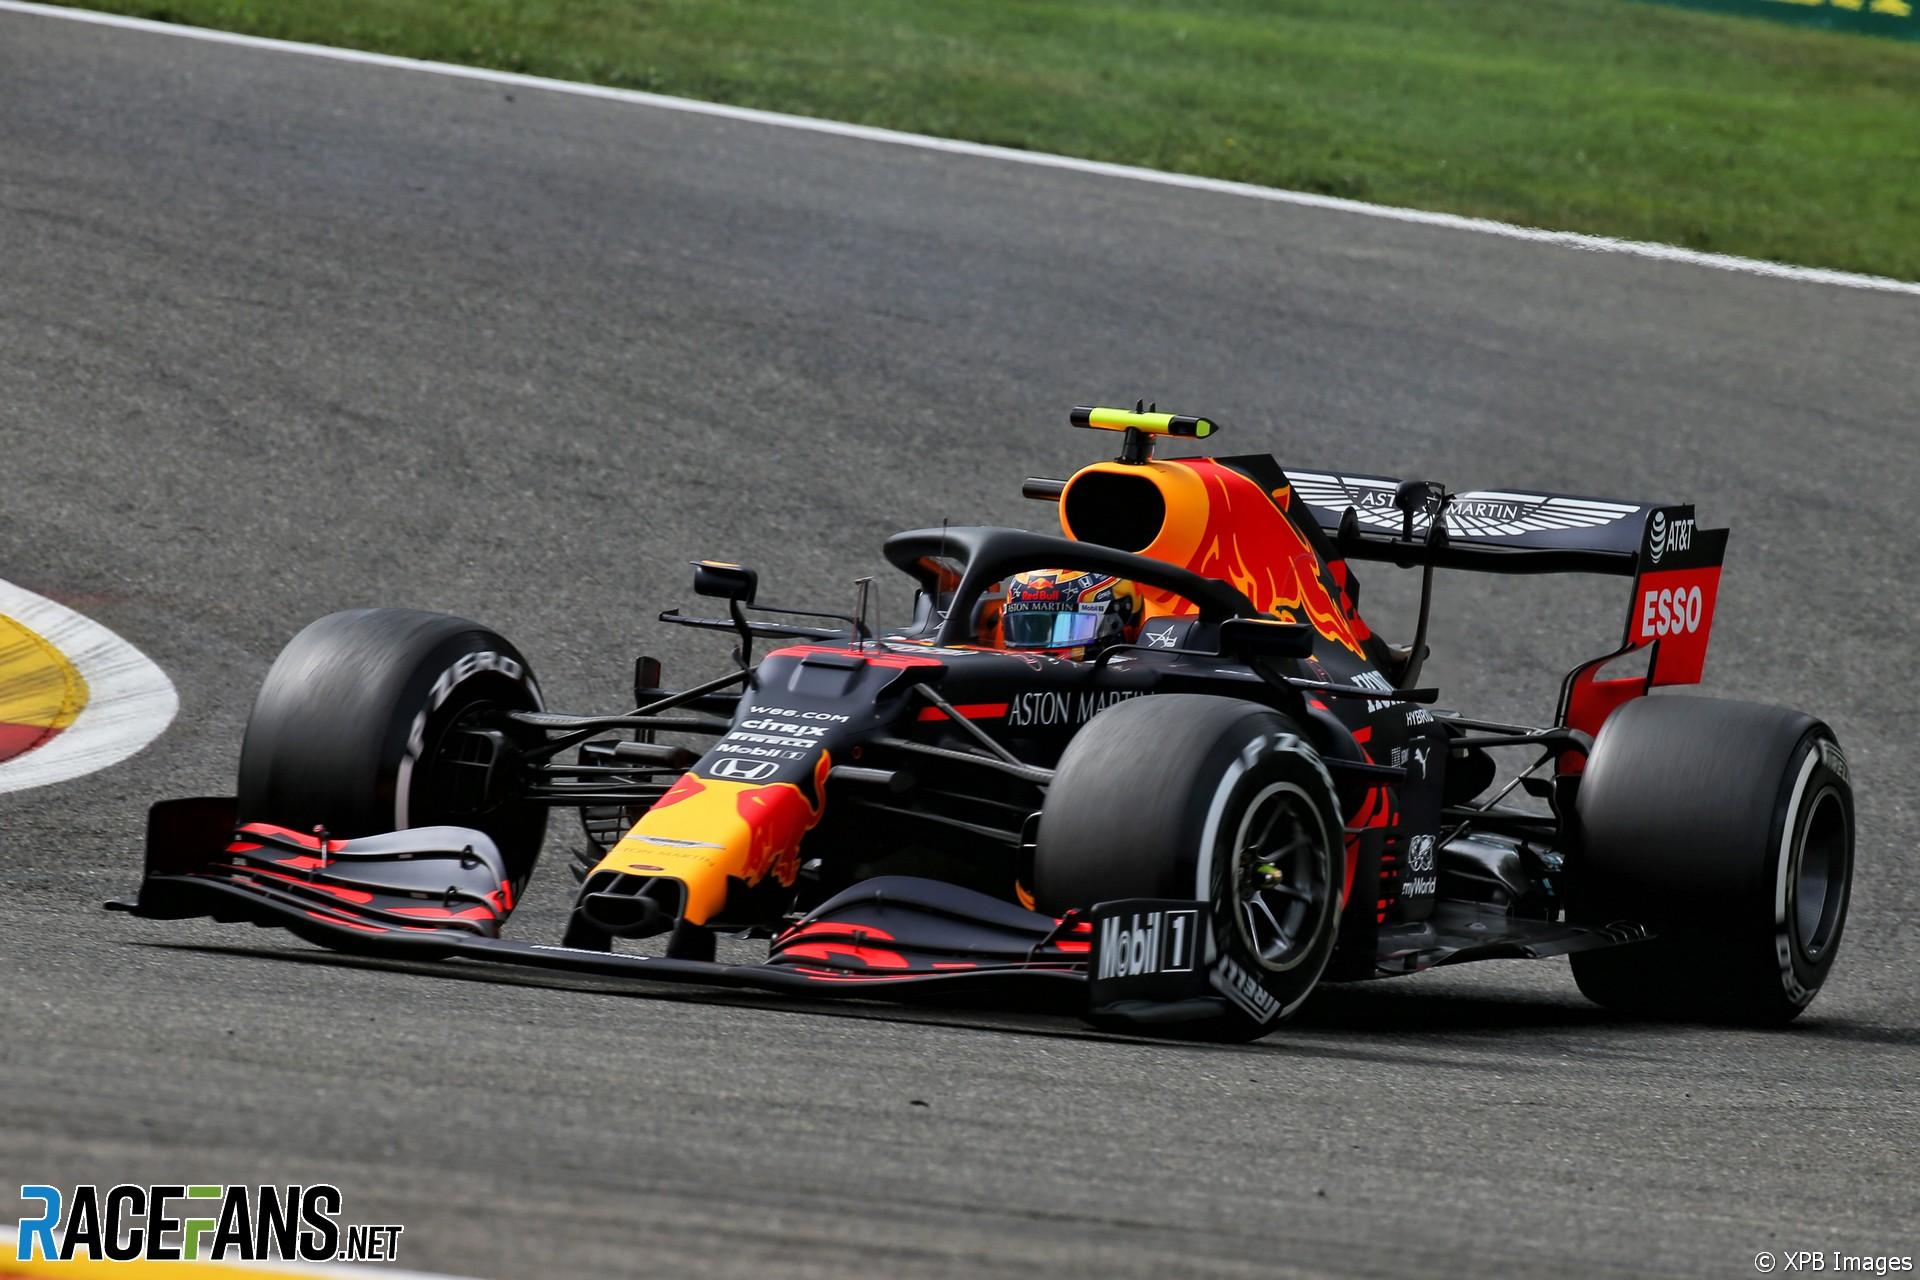 Alexander Albon, Red Bull, Spa-Francorchamps, 2020